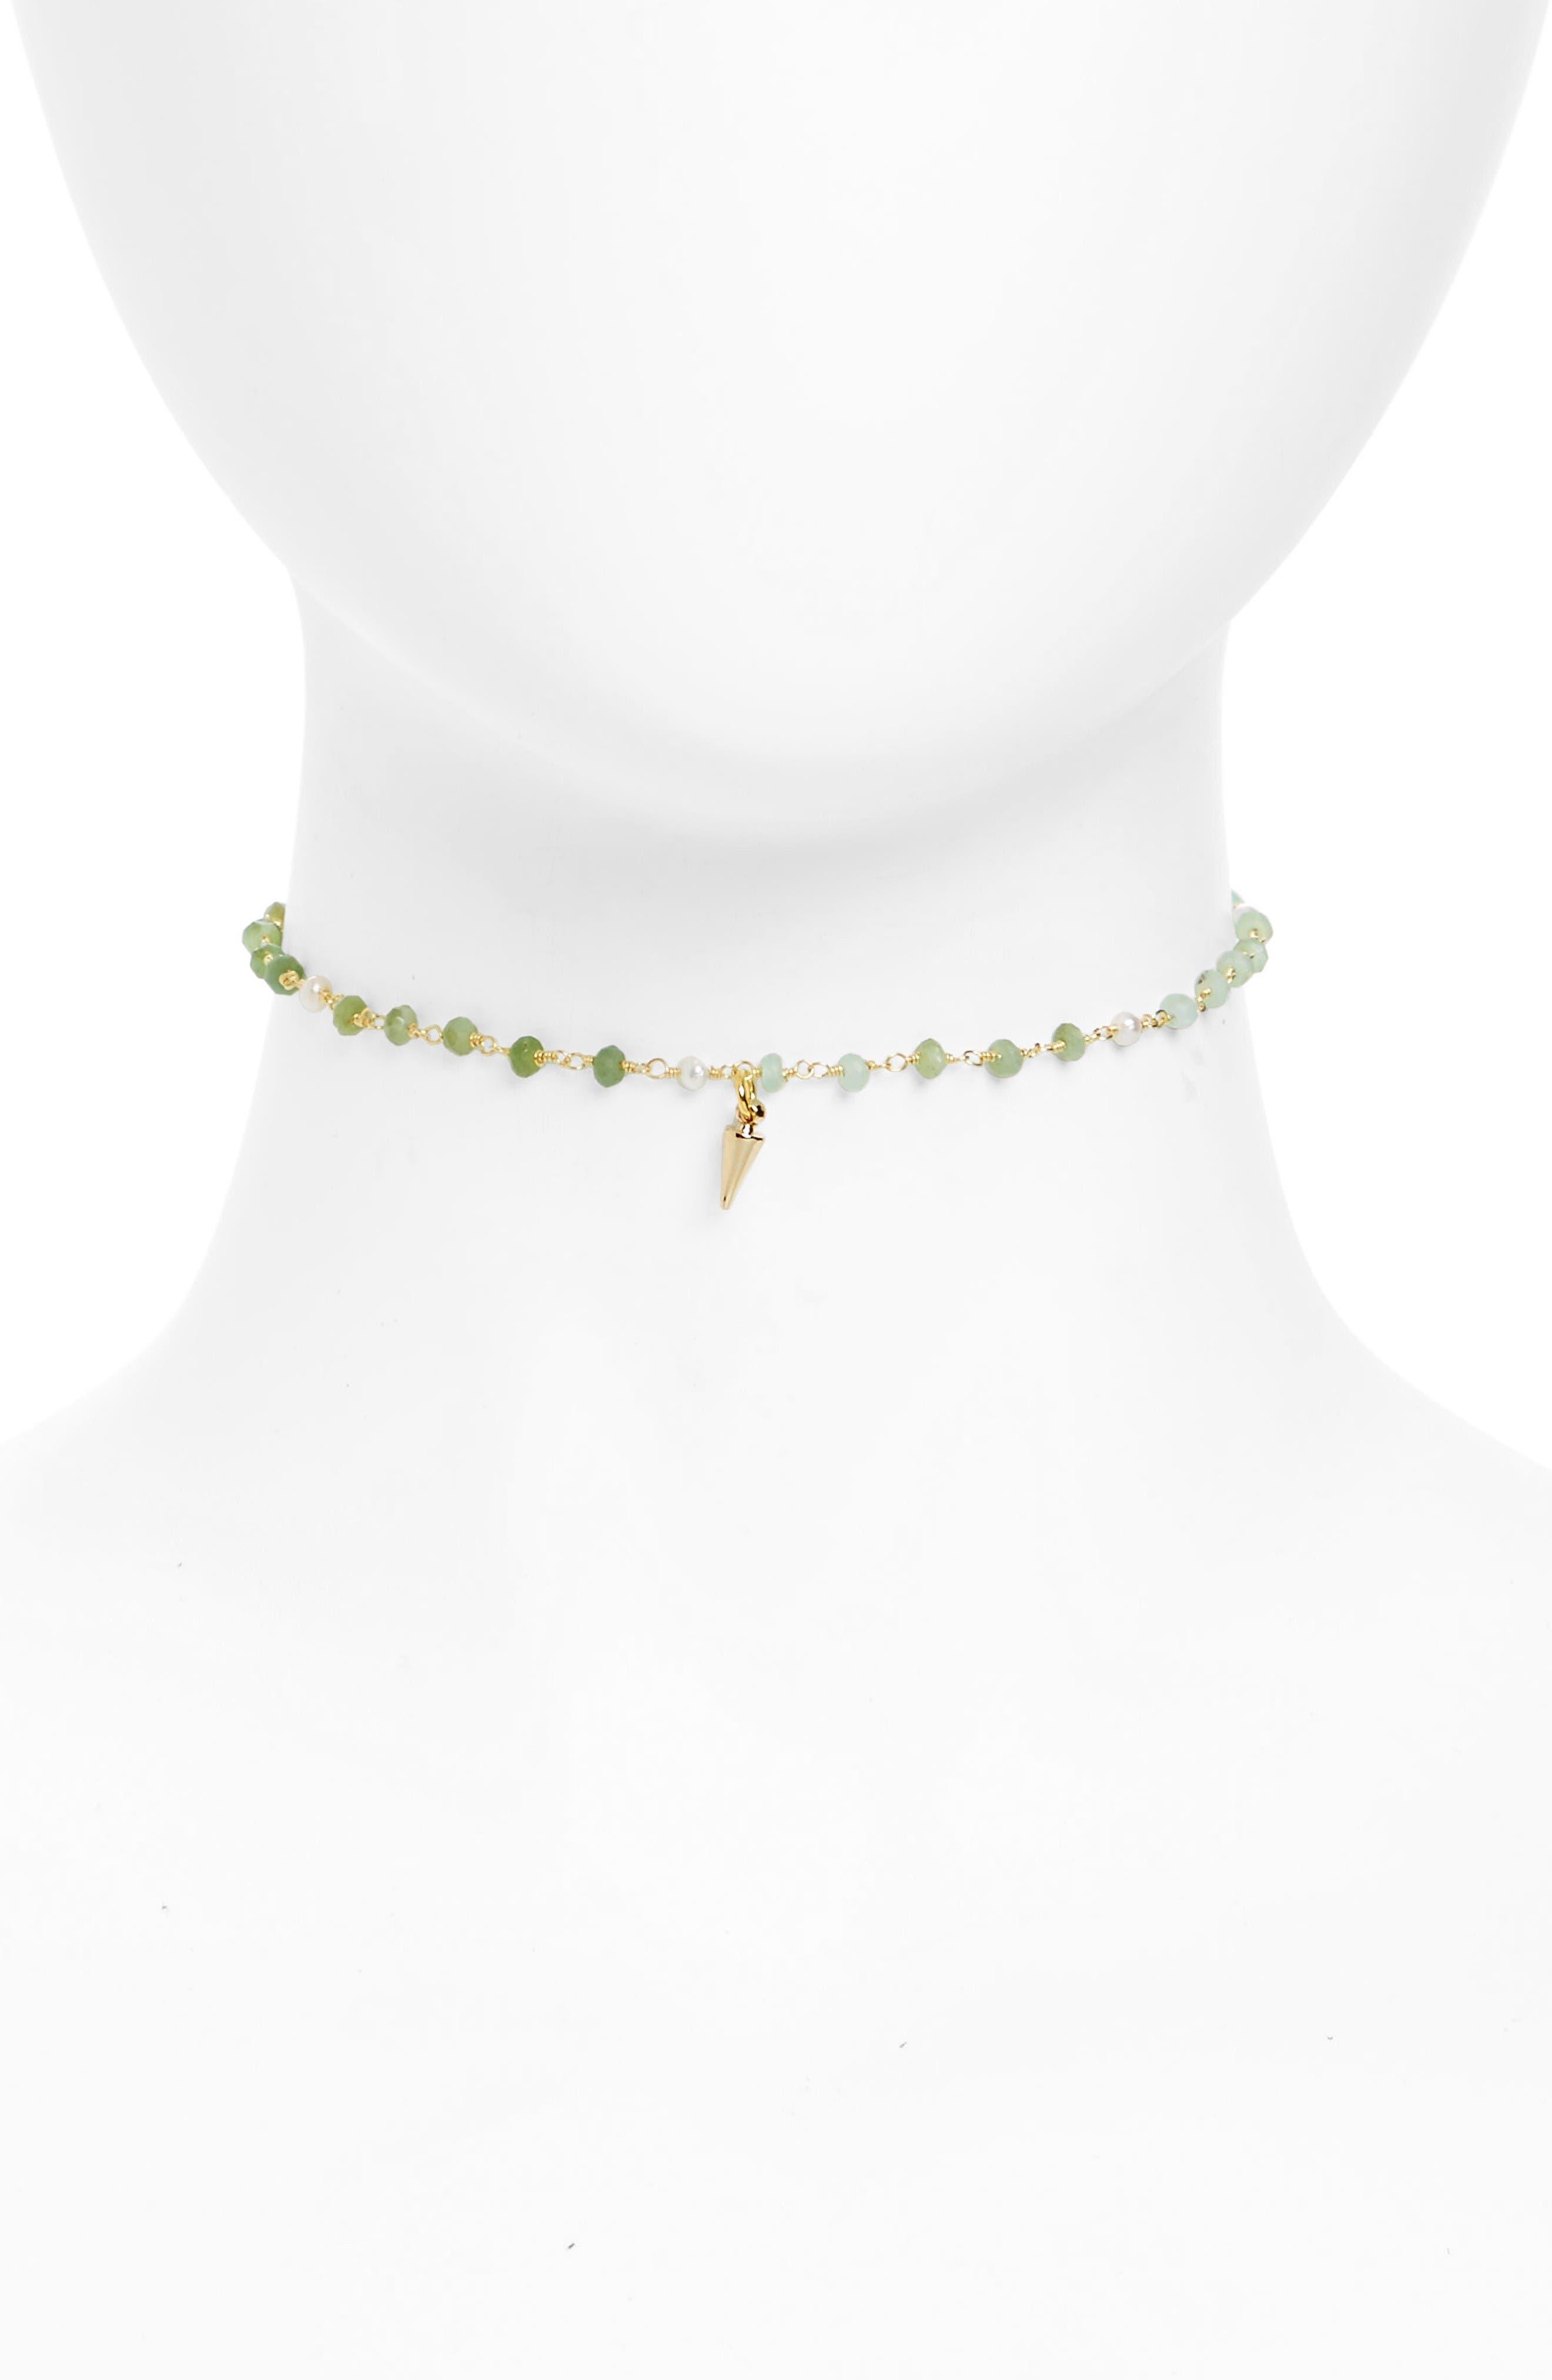 Karen London Lovers Dagger Choker Necklace